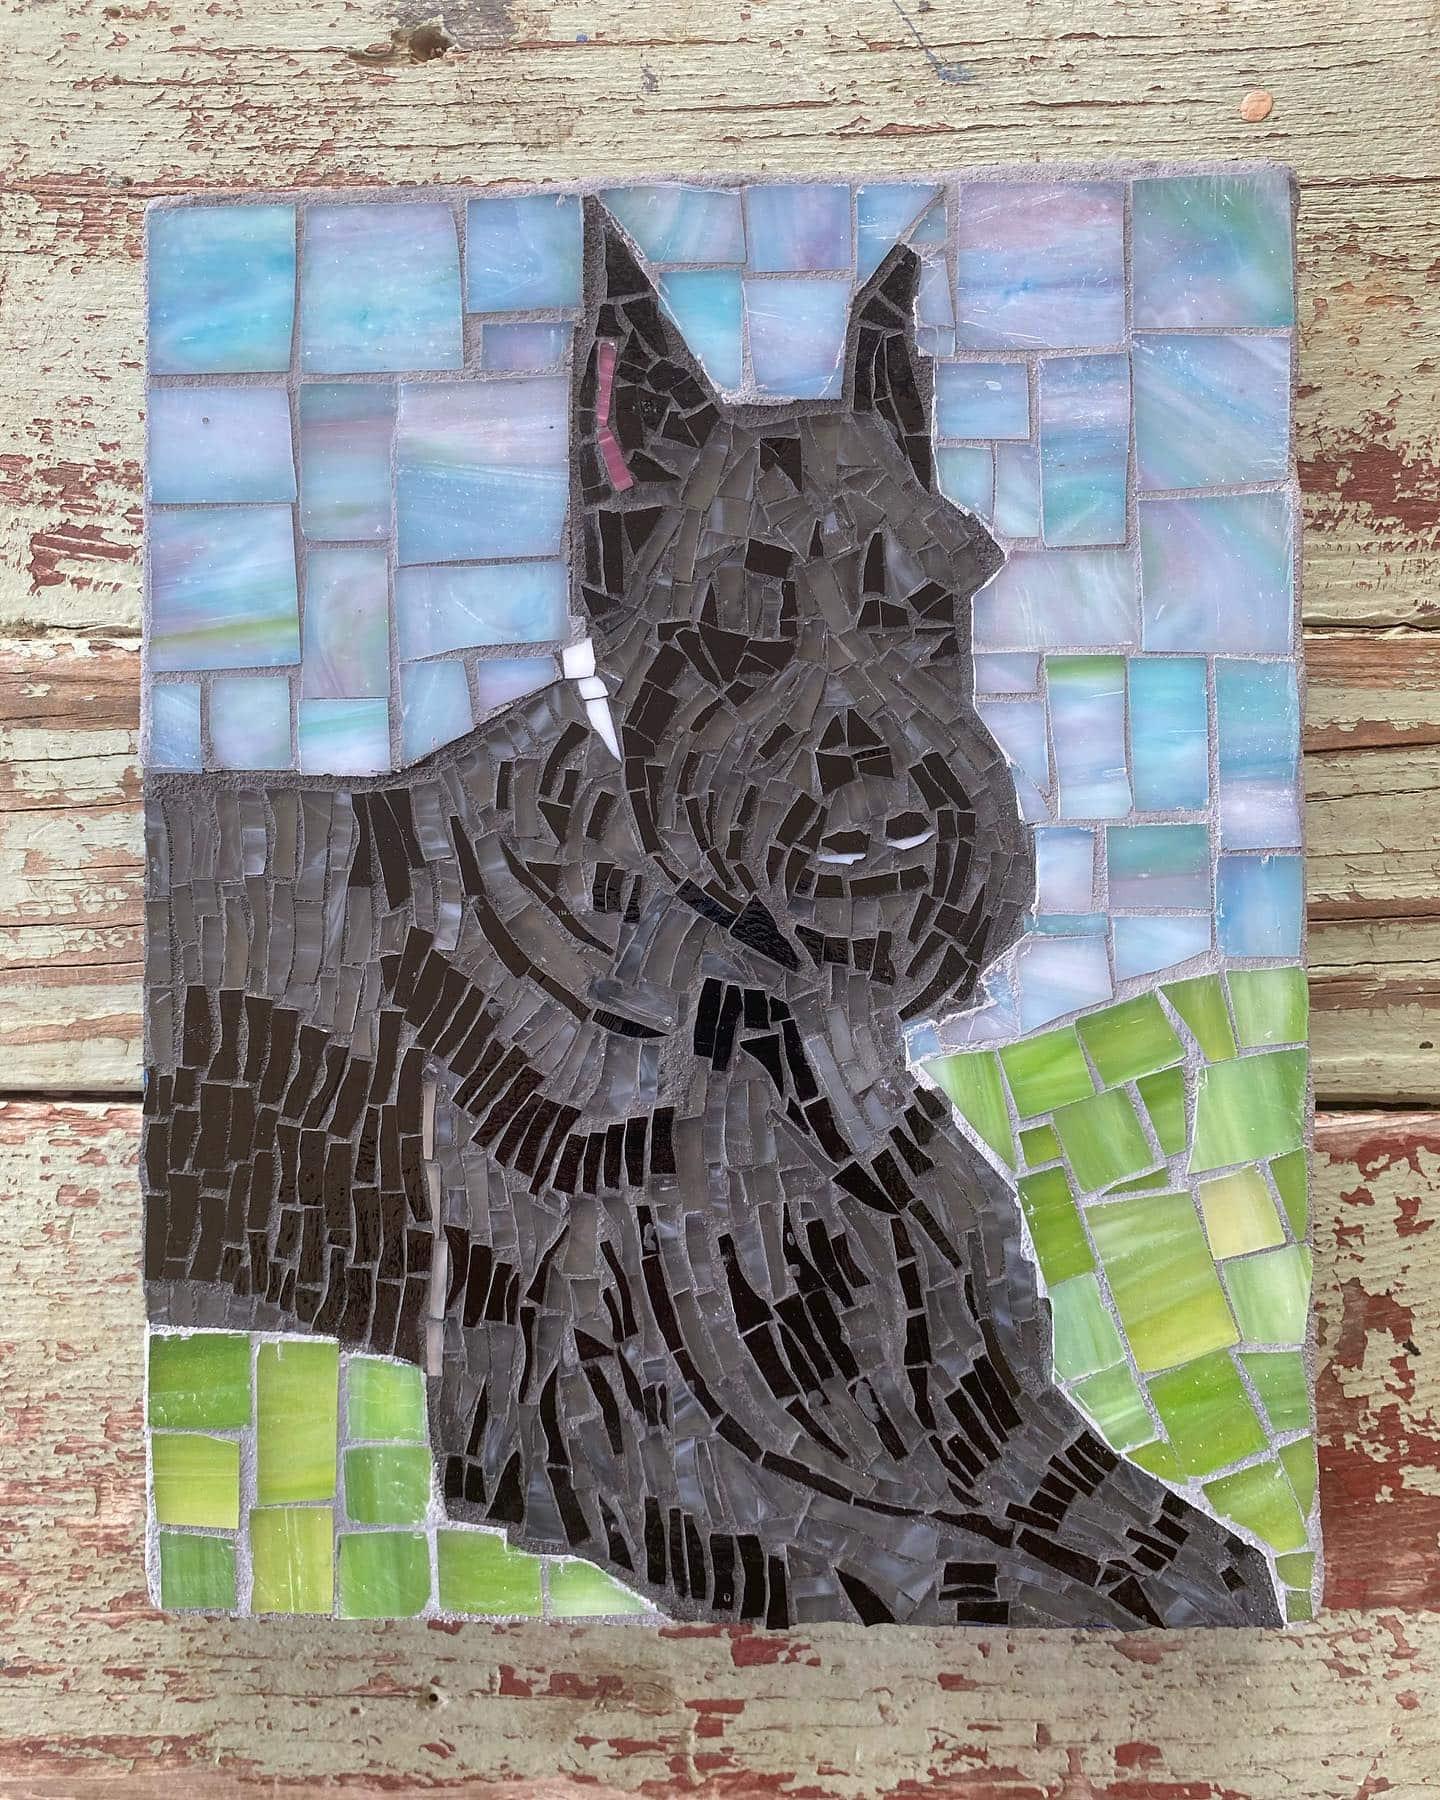 Texas Pet Co Pet Mosaic 8x10 4